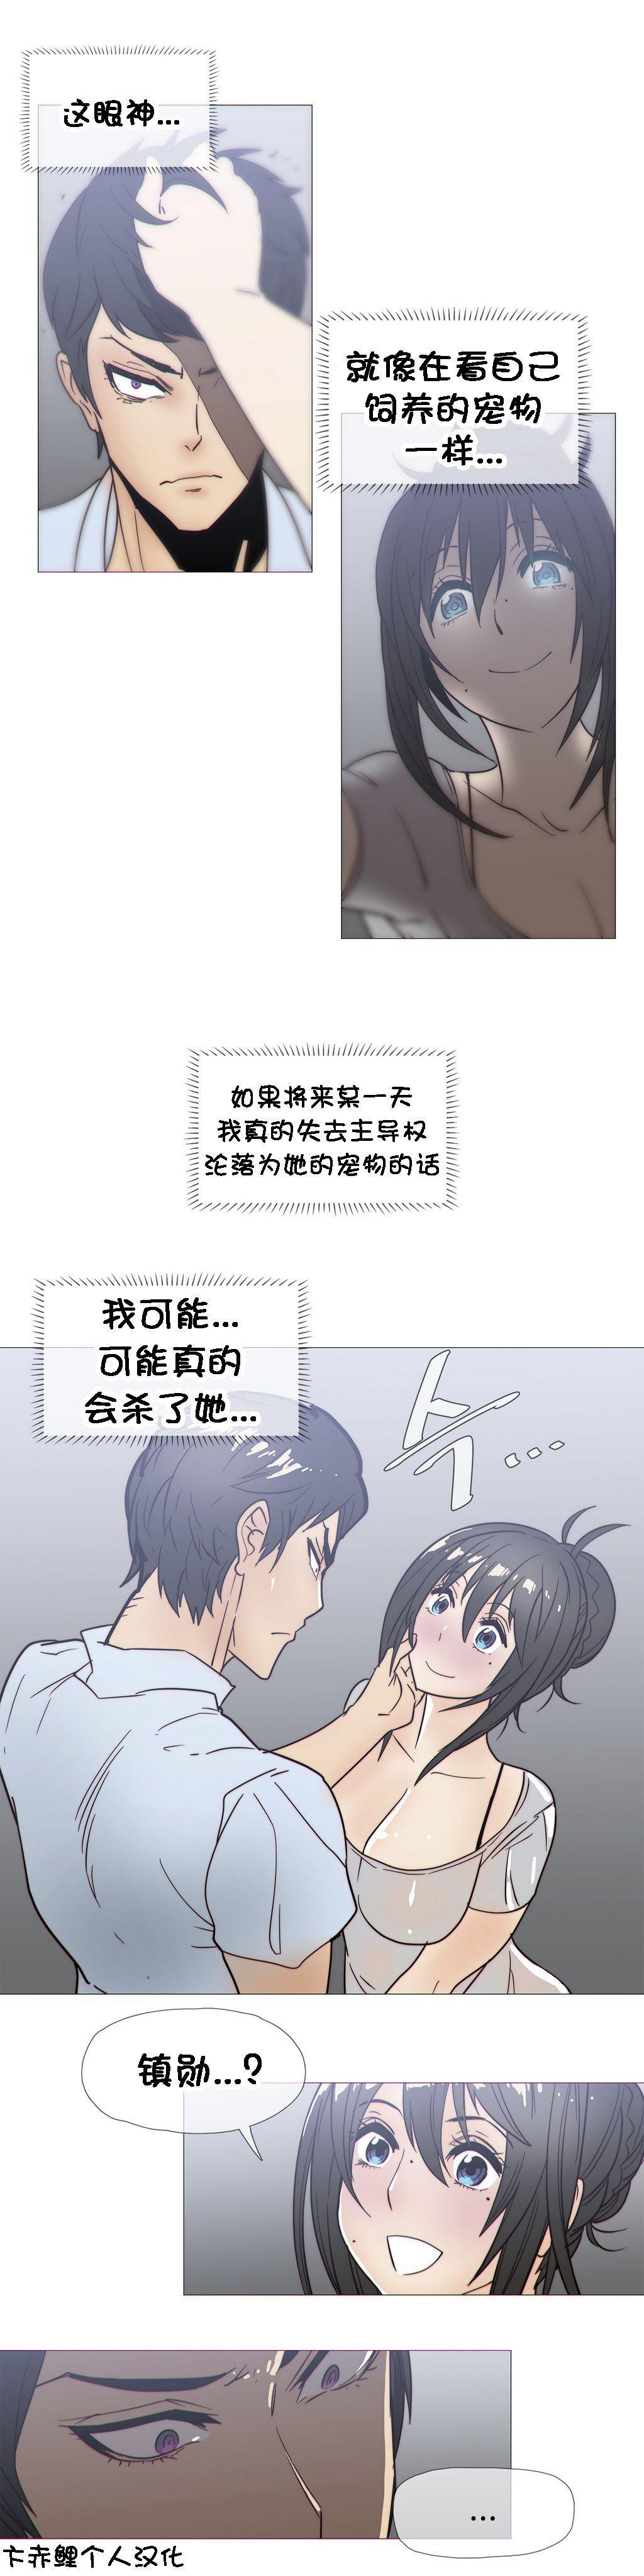 HouseHold Affairs 【卞赤鲤个人汉化】1~33话(持续更新中) 564